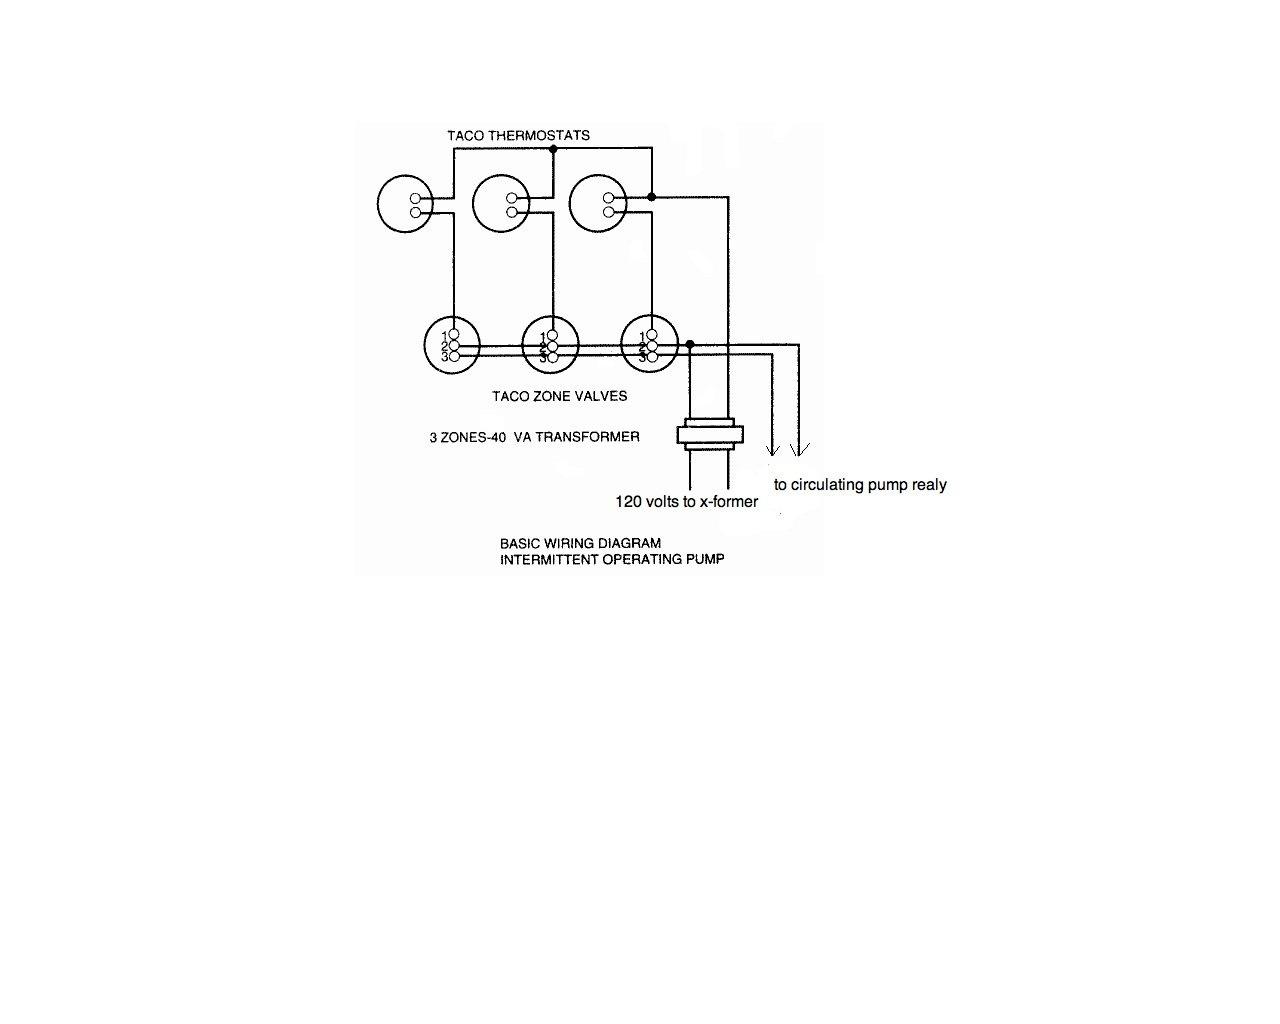 34 Taco Circulator Pump Wiring Diagram